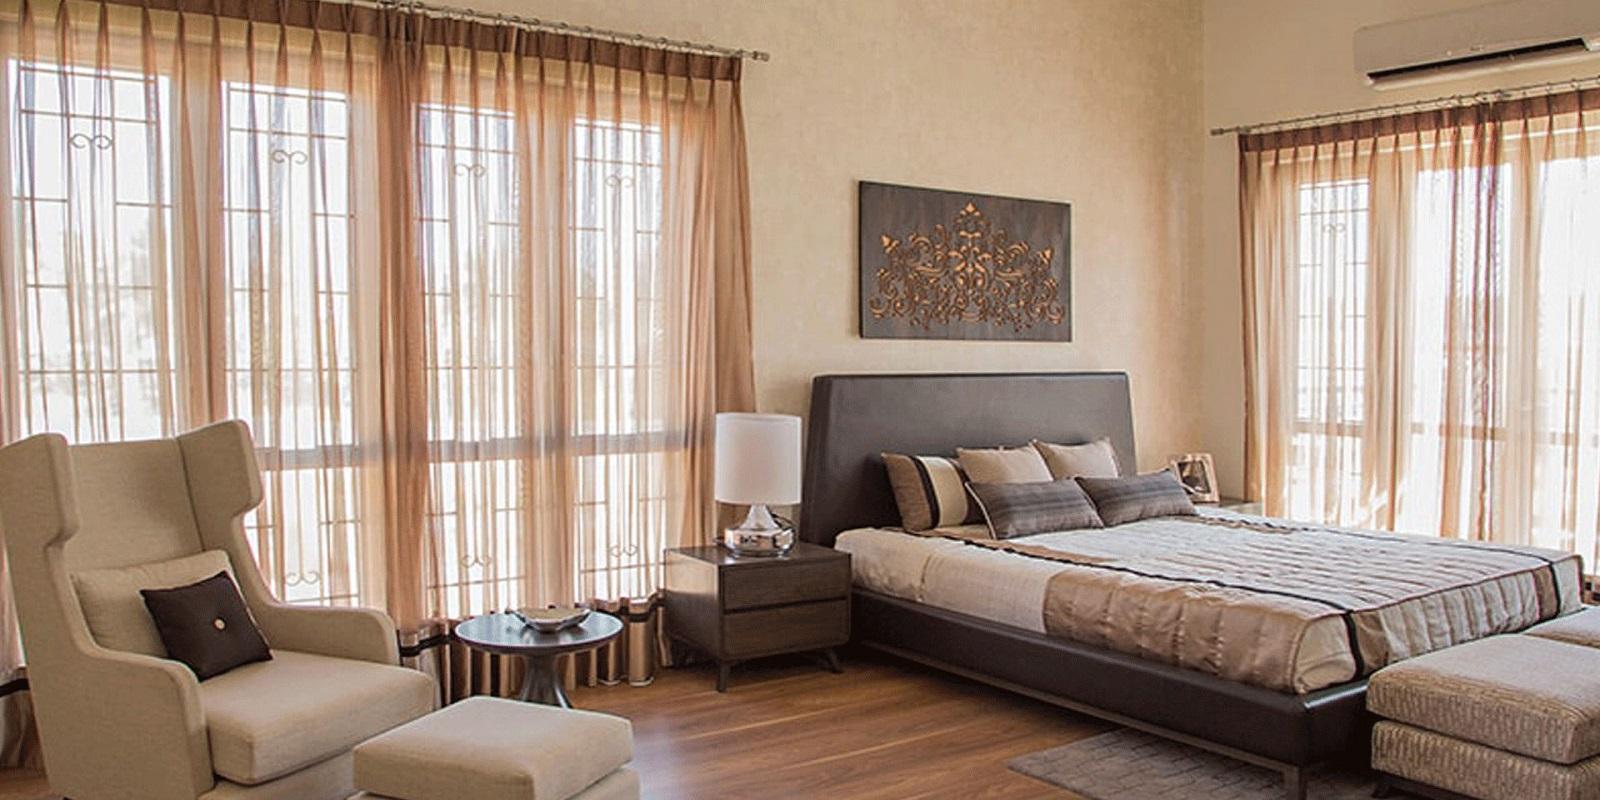 prestige glenwood project apartment interiors1